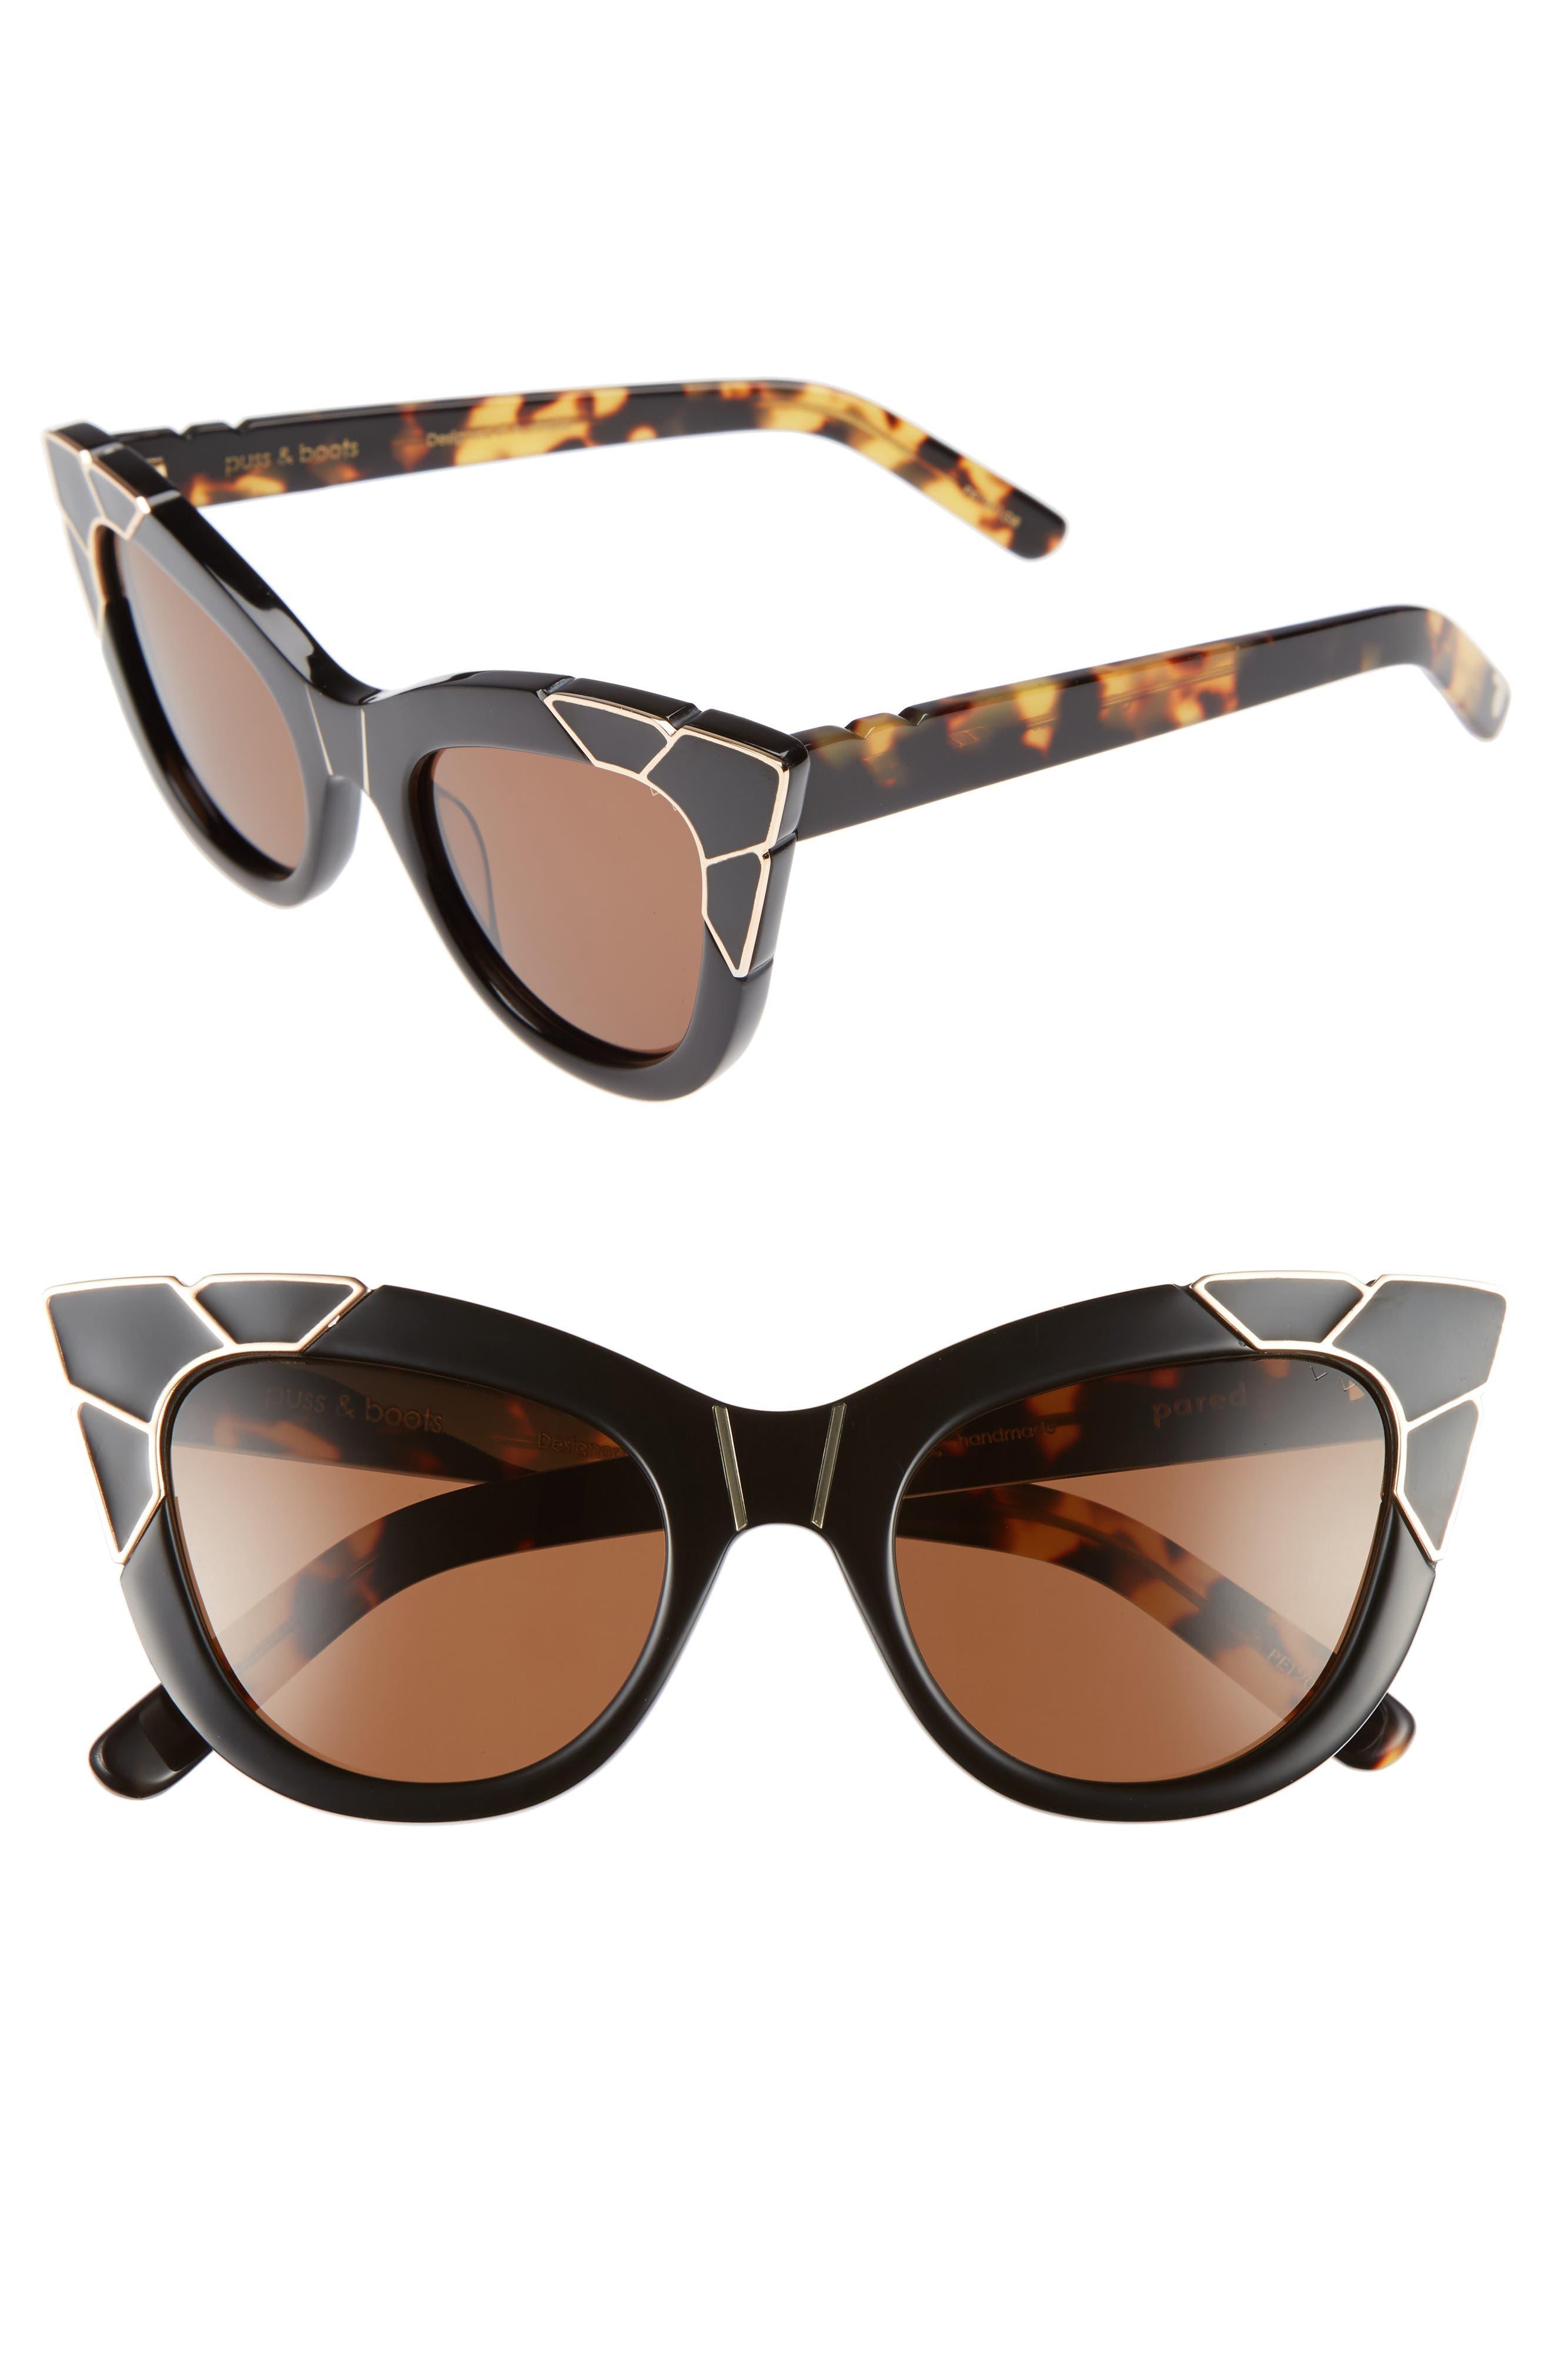 Puss & Boots 49mm Cat Eye Sunglasses,                             Main thumbnail 1, color,                             BLACK/ GOLD/ BLACK BROWN